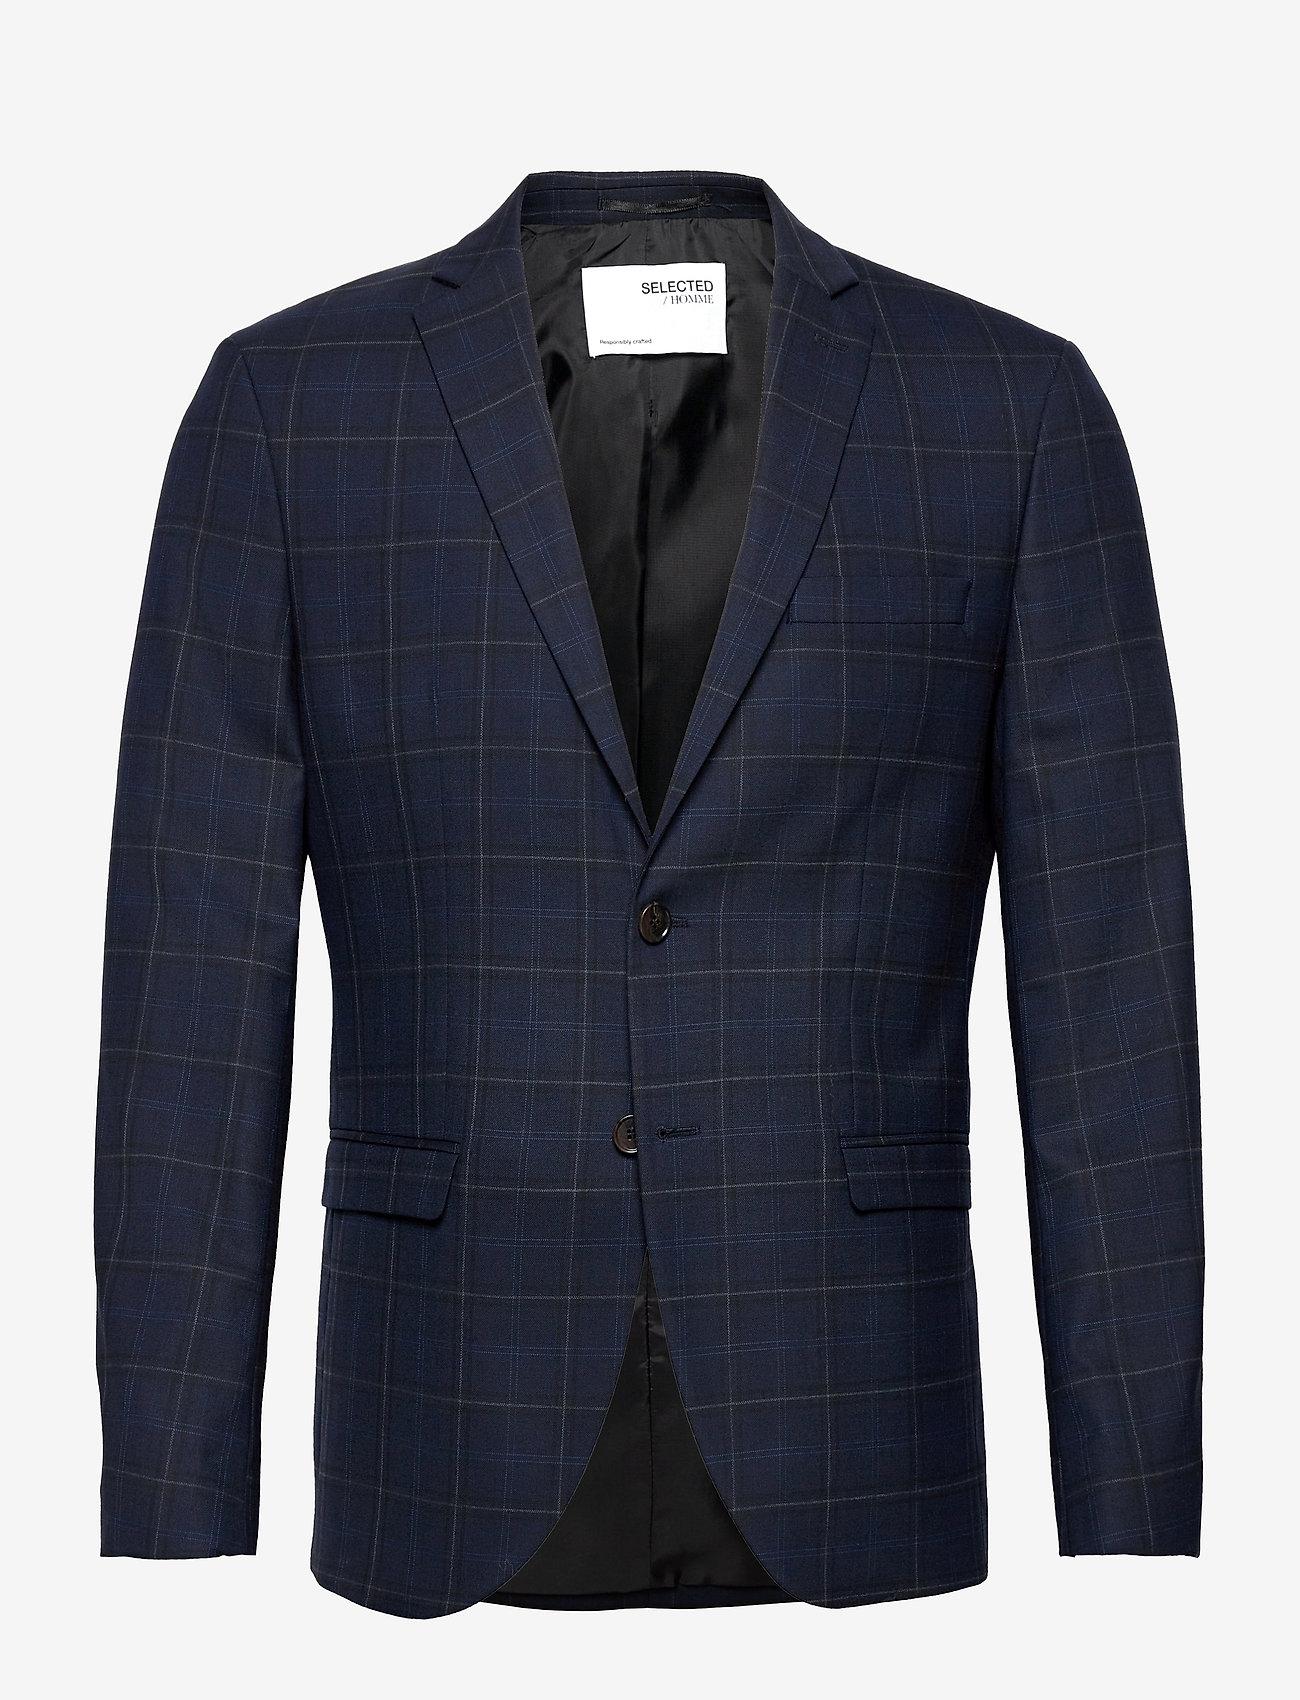 Selected Homme - SLHSLIM-MYLOBILL DK BLU GRCHK BLZ B - blazers à boutonnage simple - dark blue - 0